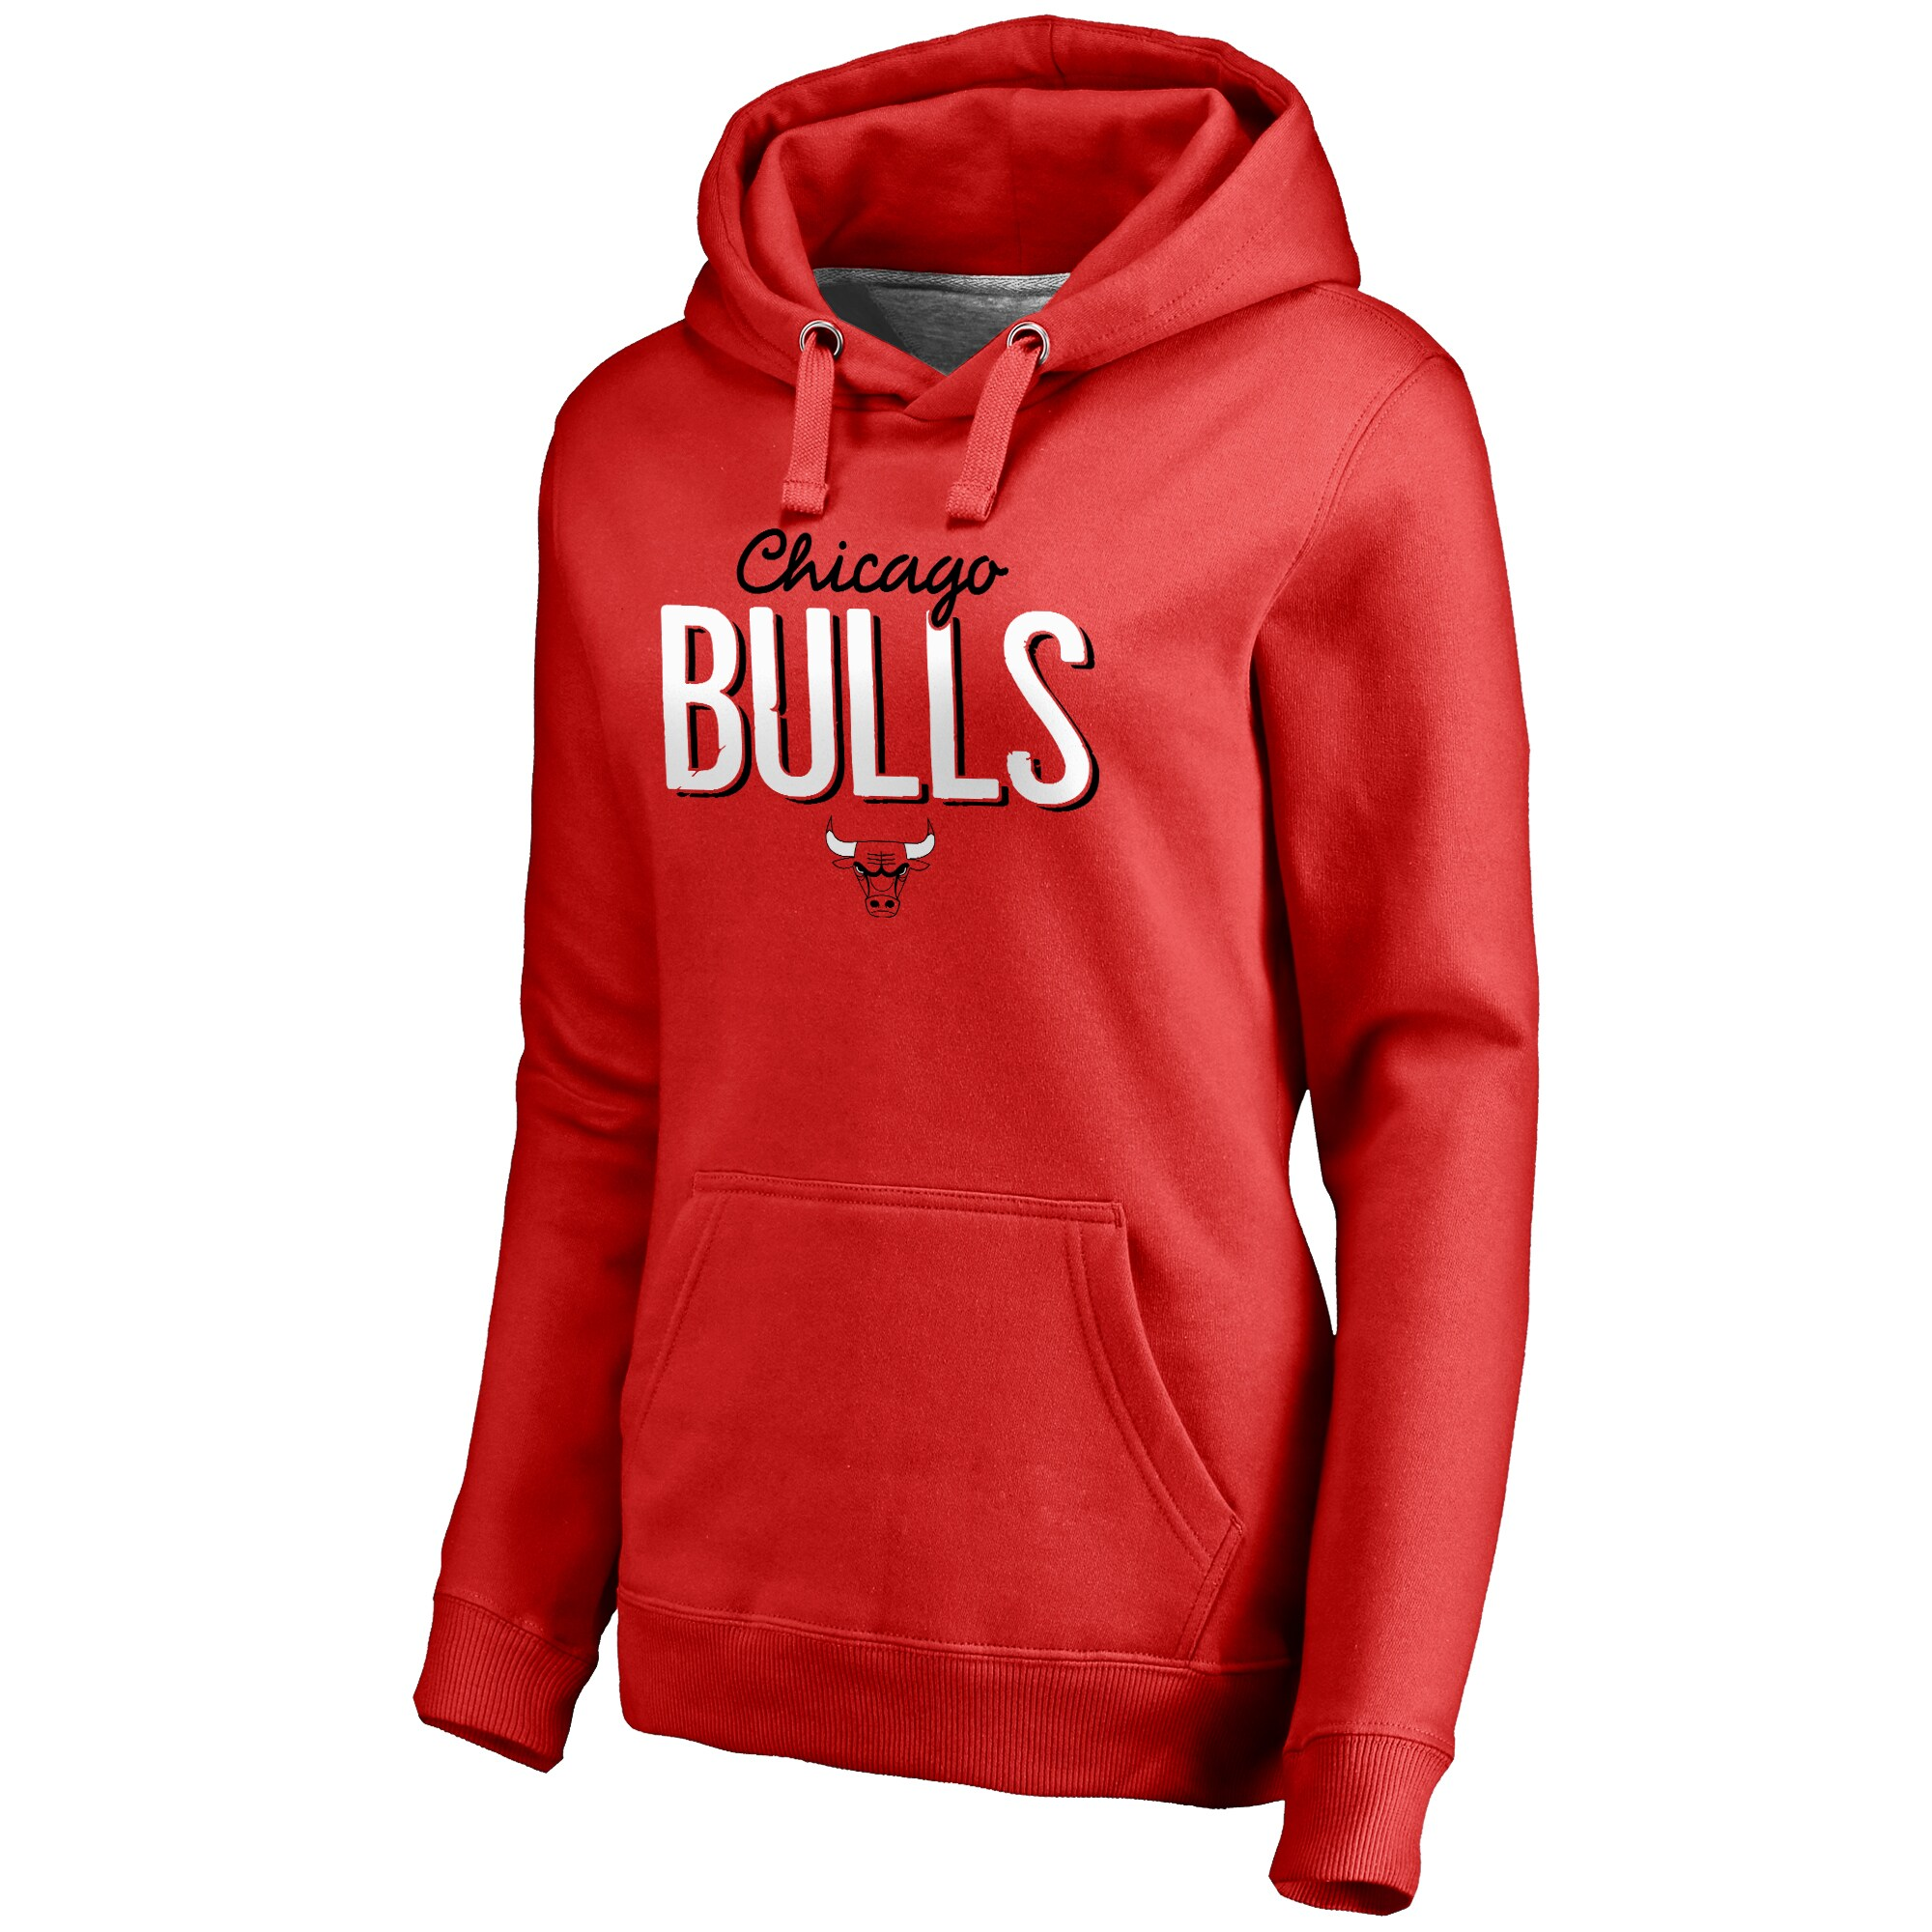 Chicago Bulls Women's Nostalgia Pullover Hoodie - Red